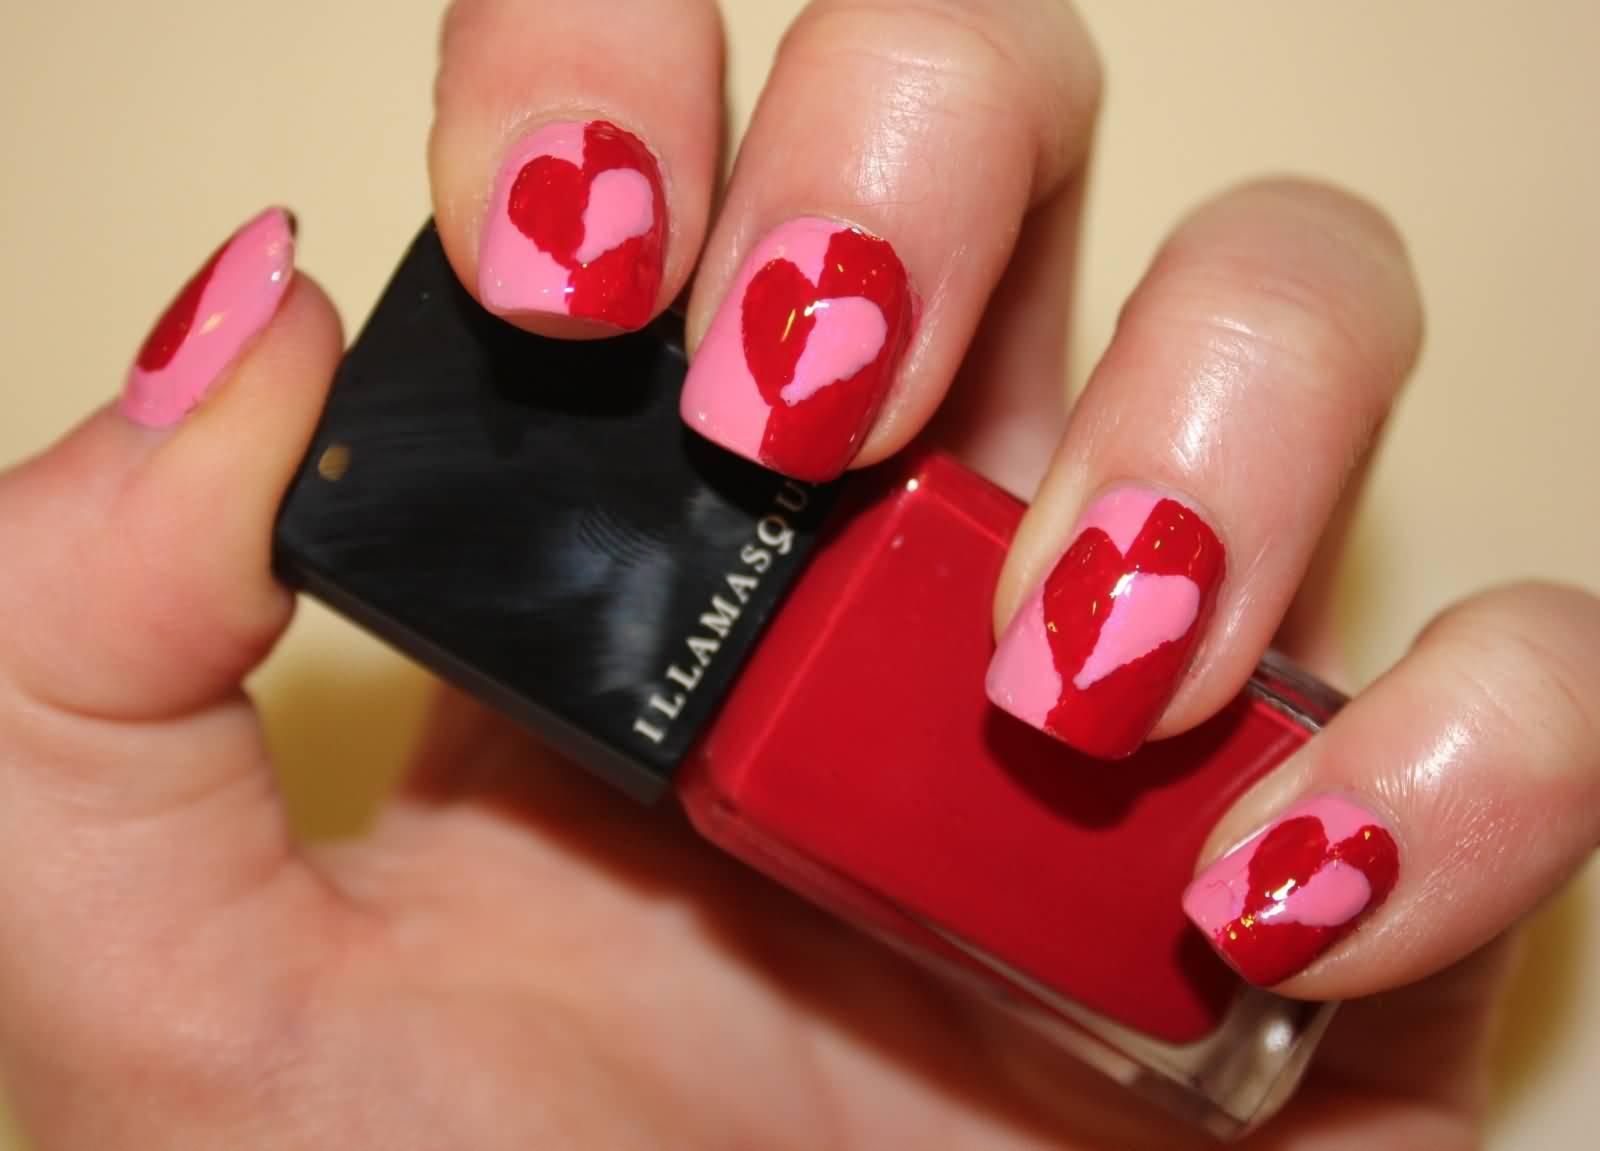 60 latest red heart nail art design ideas pink and red heart nail art design idea prinsesfo Images